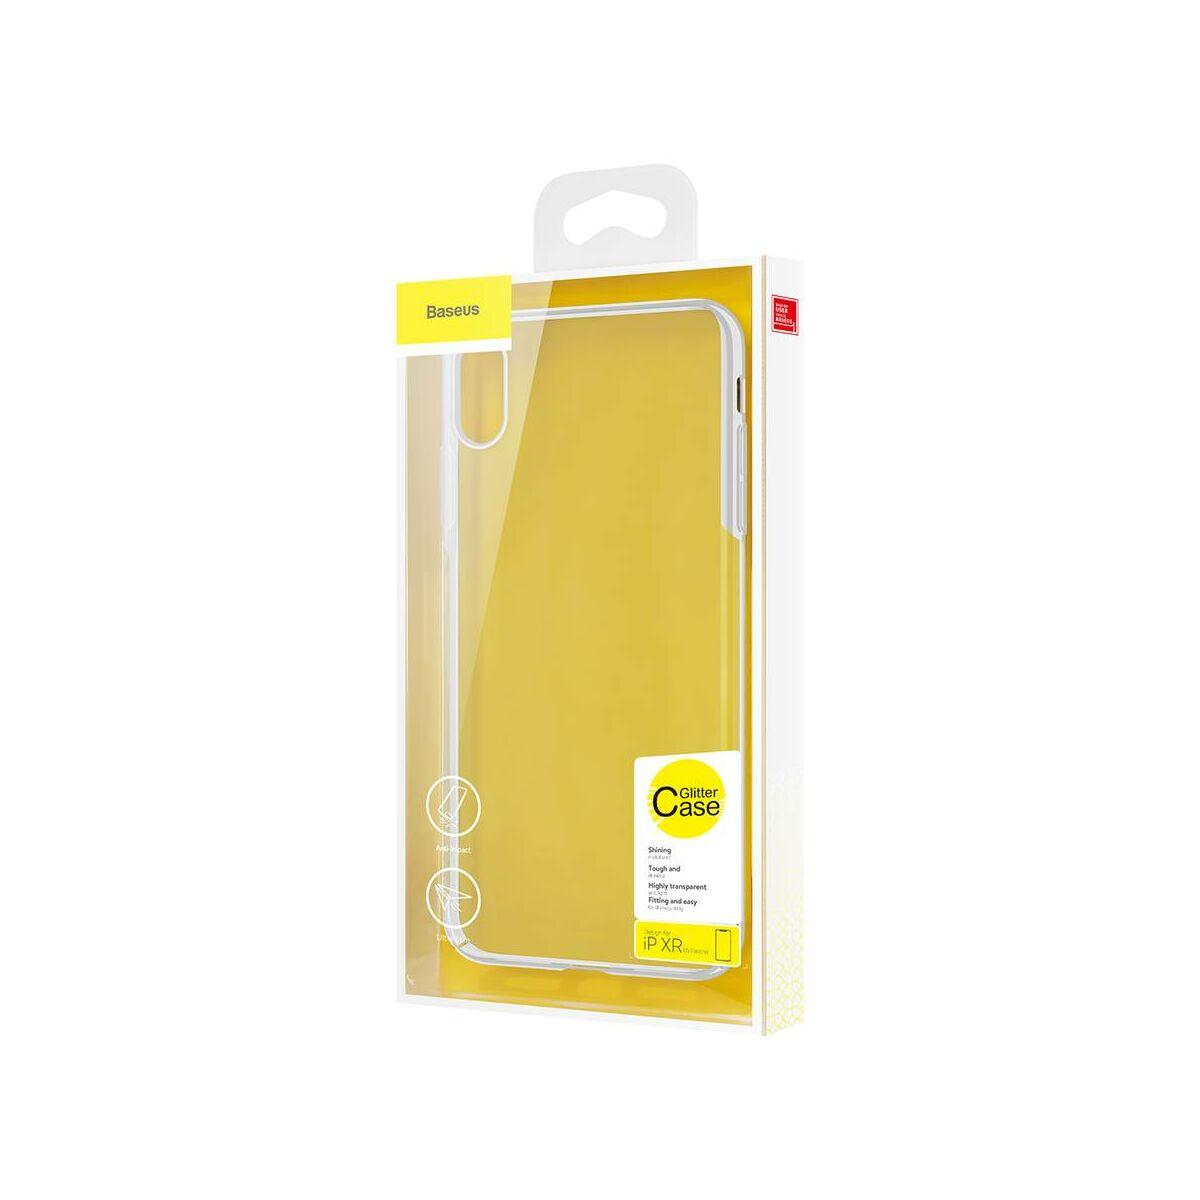 Baseus iPhone XR tok, Glitter, fehér (WIAPIPH61-DW02)